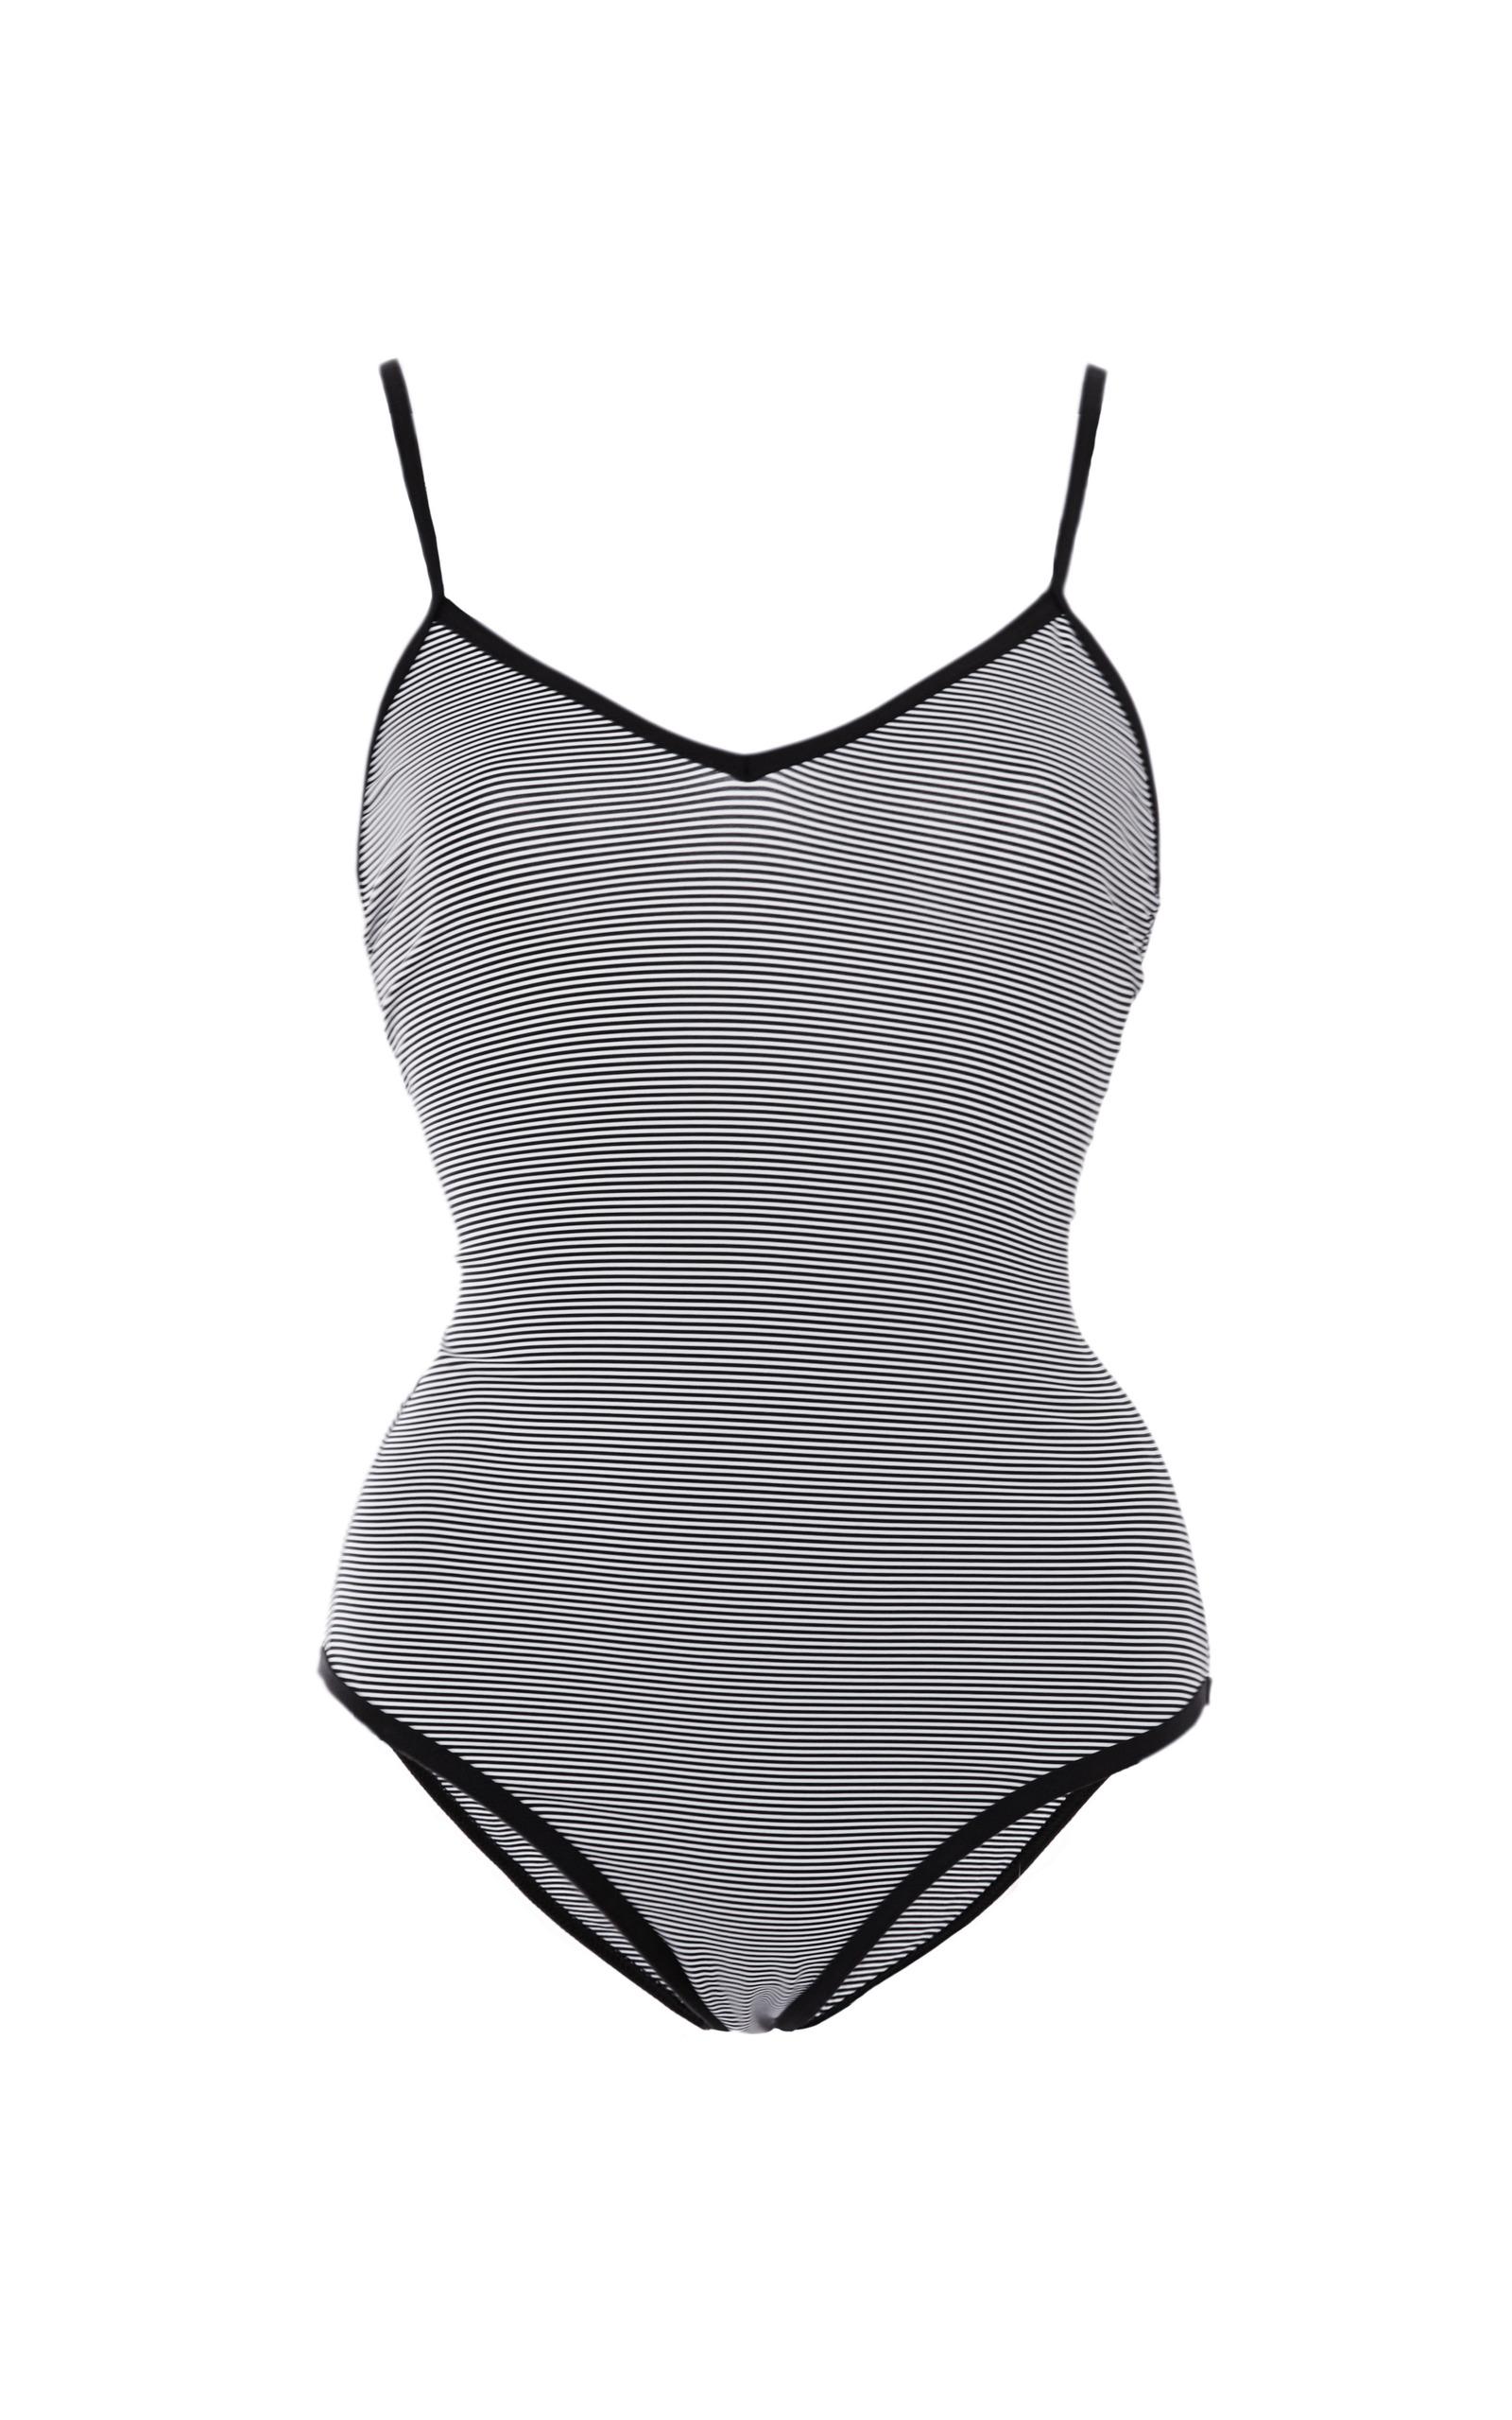 6ff7f4ee59 Stripe One-Piece Bathing Suit by Petit Bateau